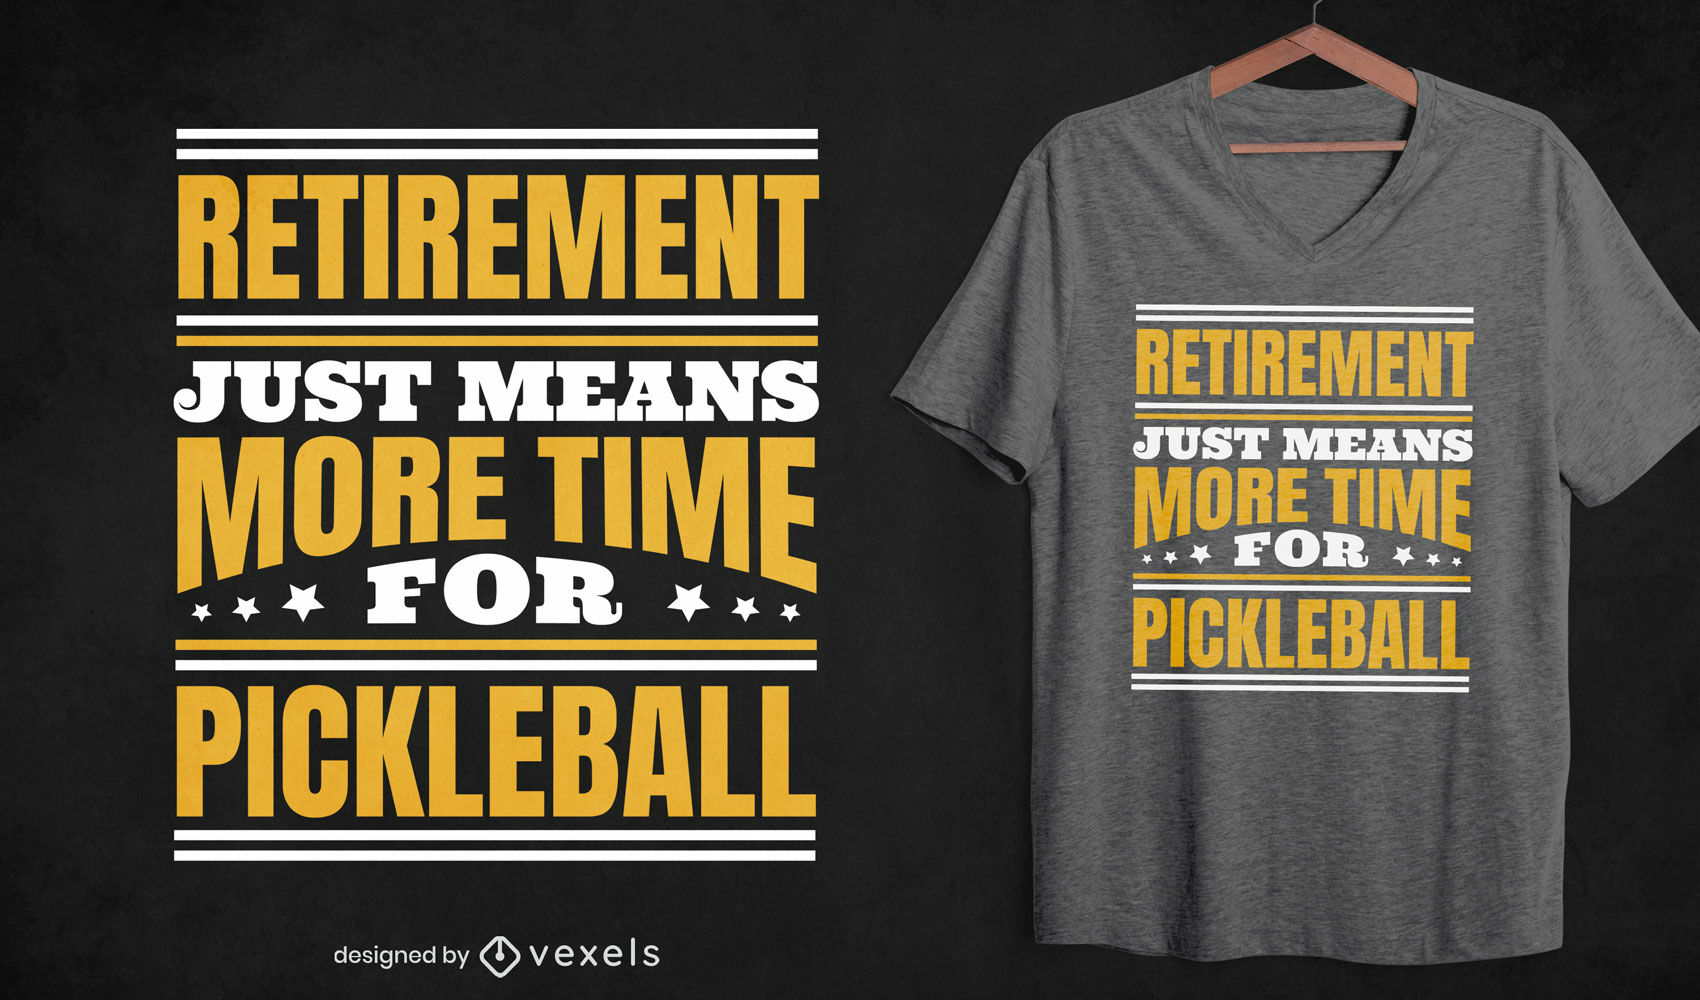 Retirement pickleball quote t-shirt design